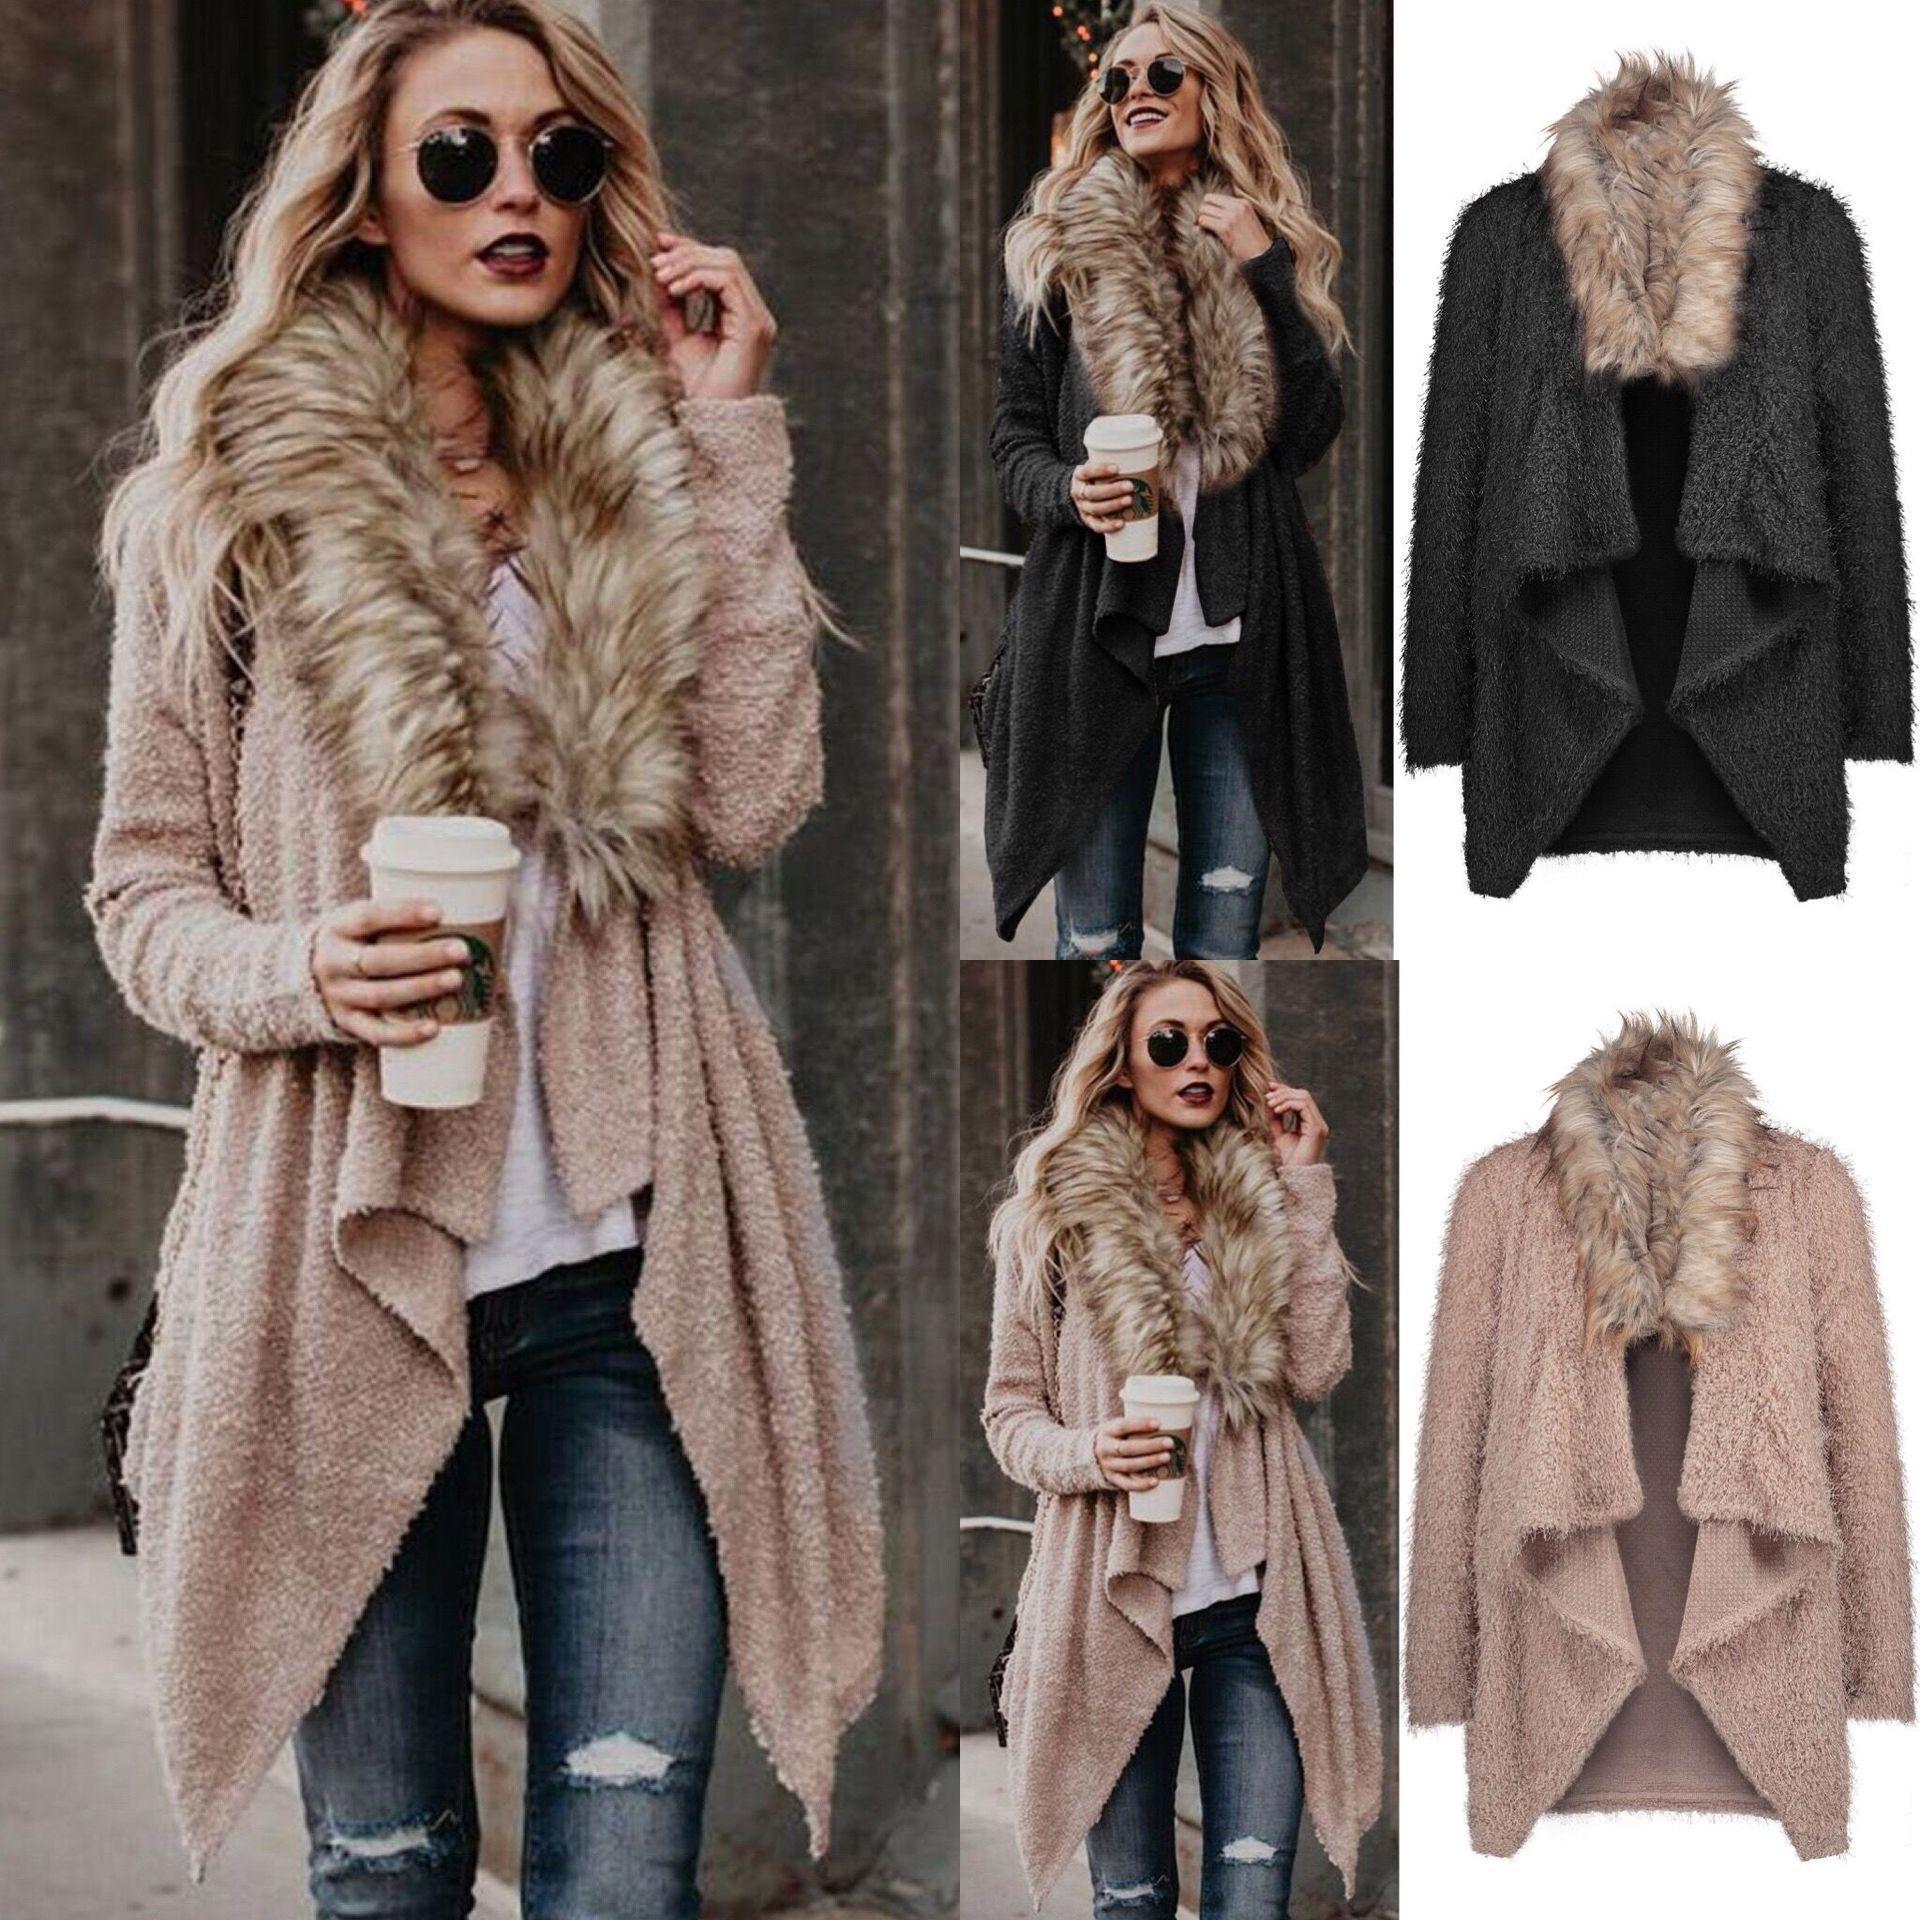 Fashion-Wholesale New Style Women Cardigan With Fur Collar Plush Windbreaker Women Sweaters Street Style Lapel Personality Designer Sweater